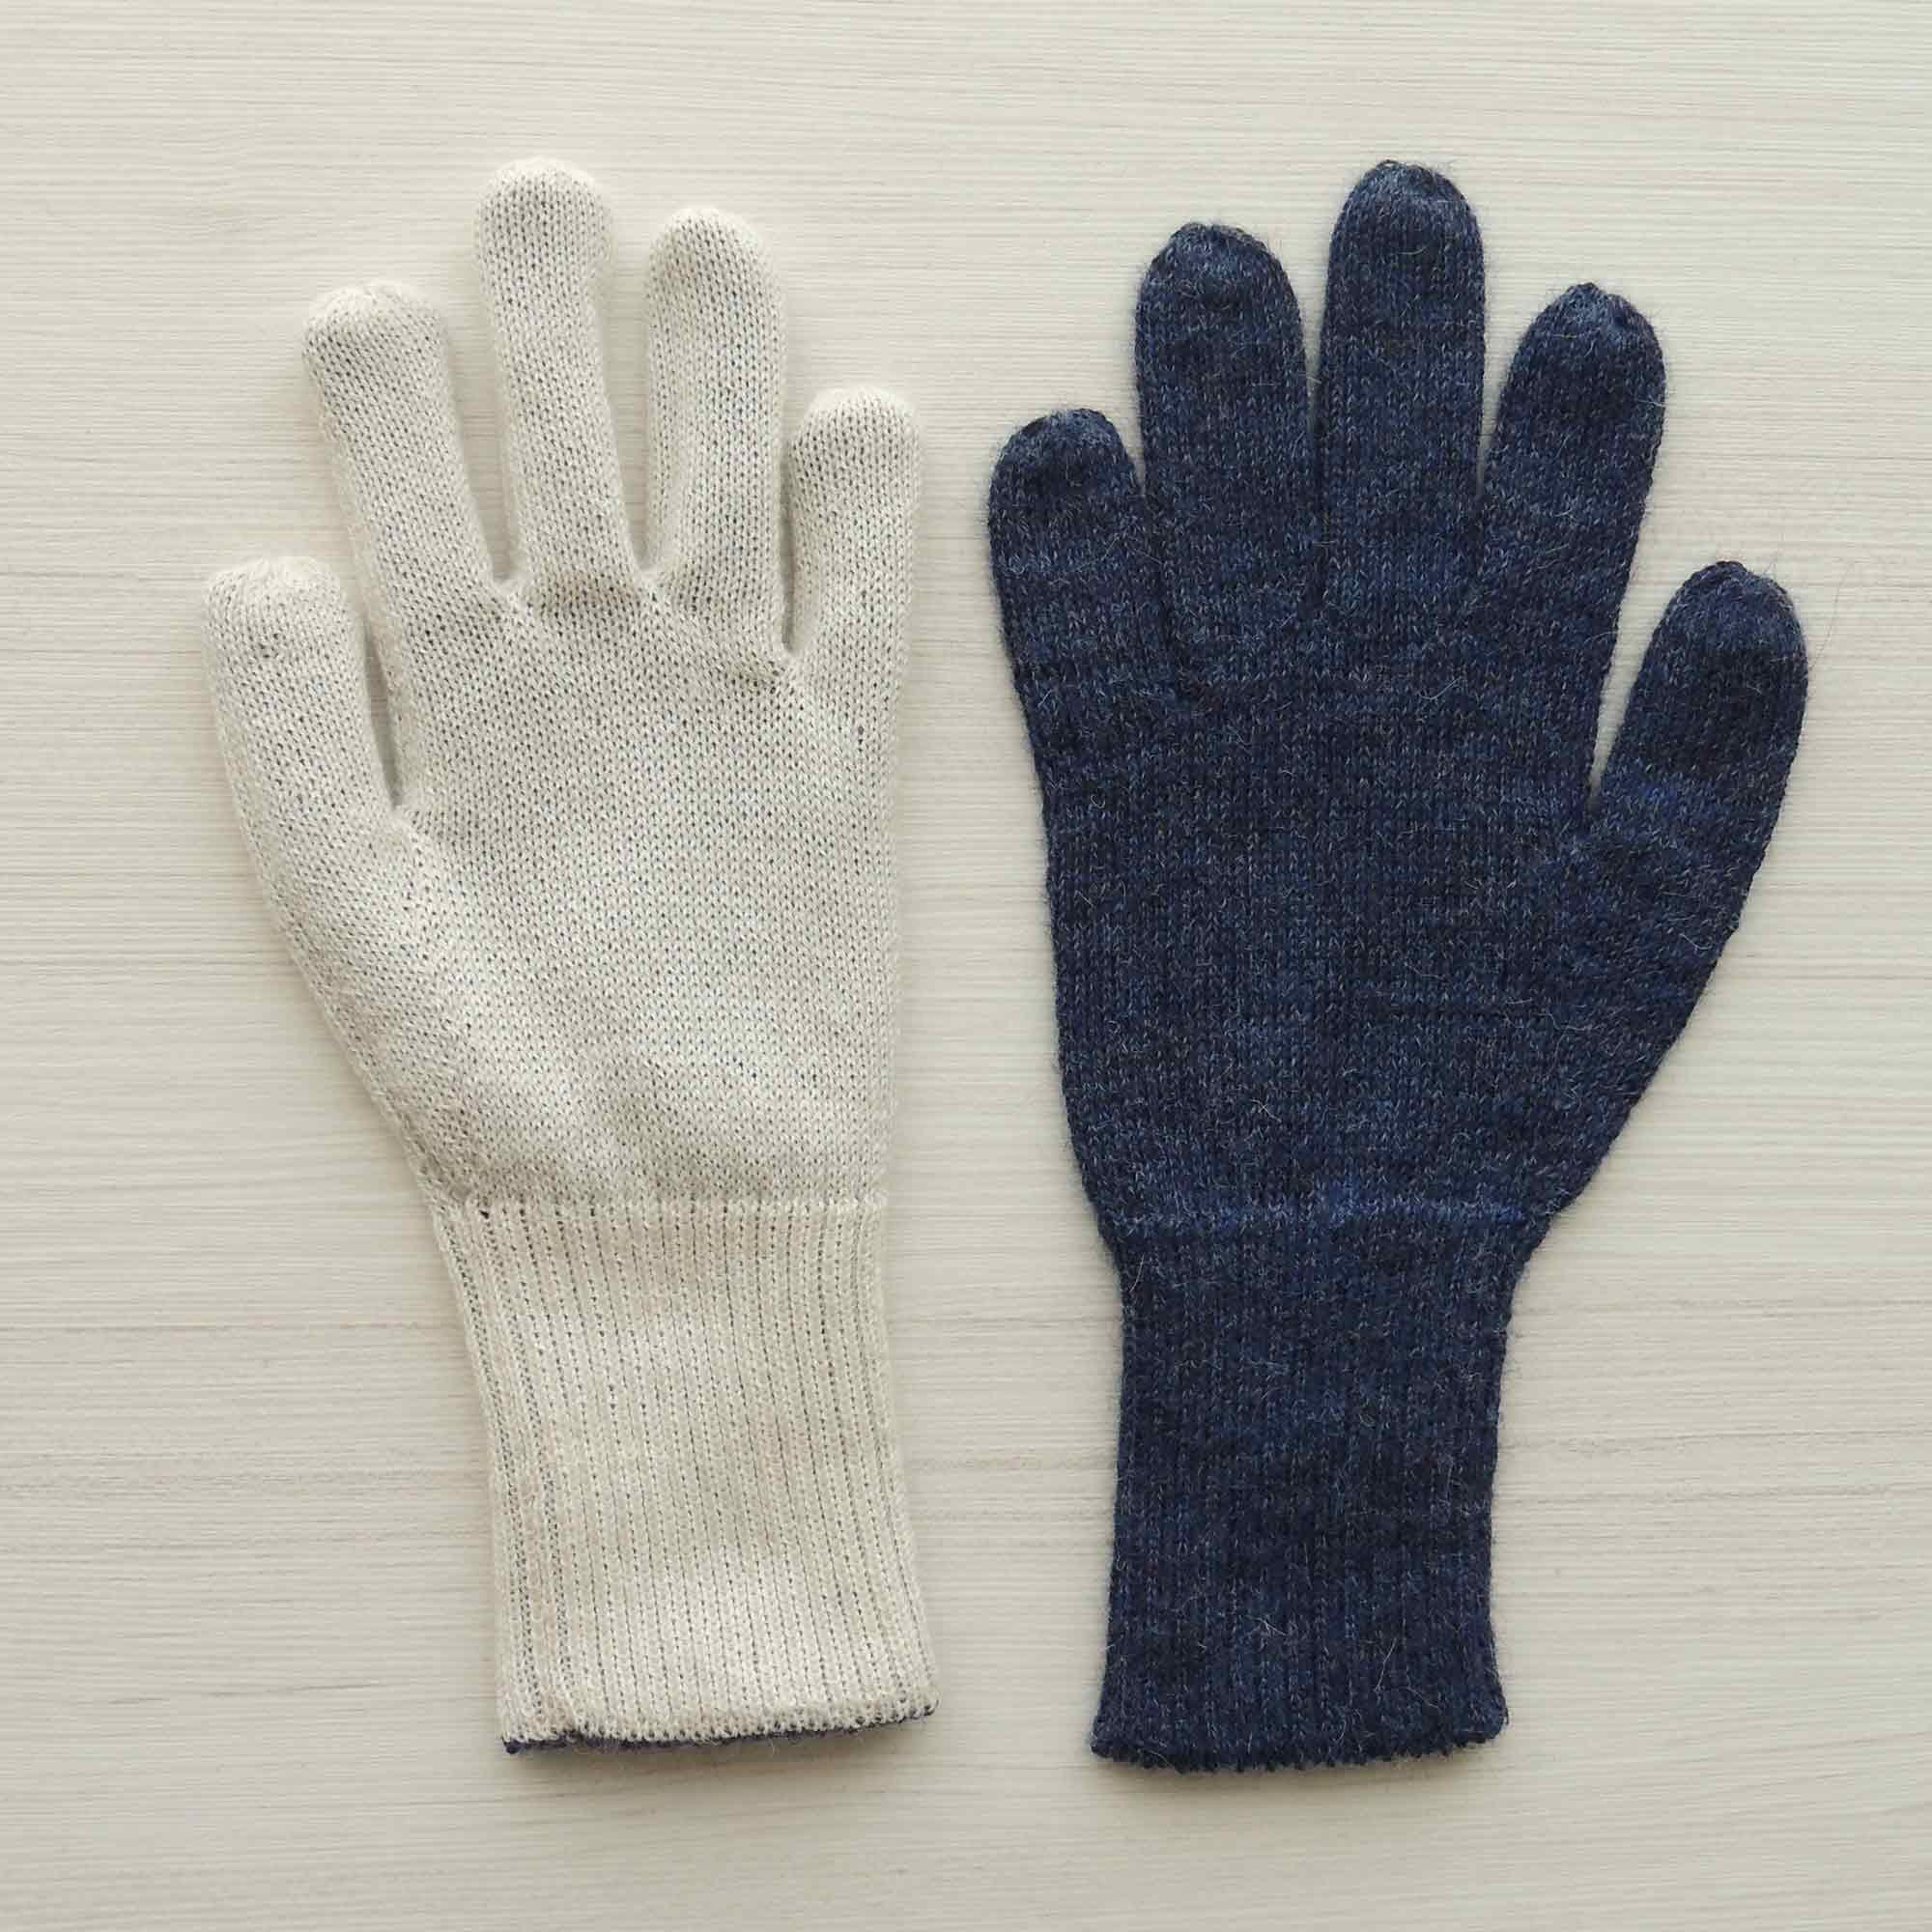 PopsFL Knitwear producer / wholesale 001-21-1013 Winter gloves, reversible two colors baby alpaca